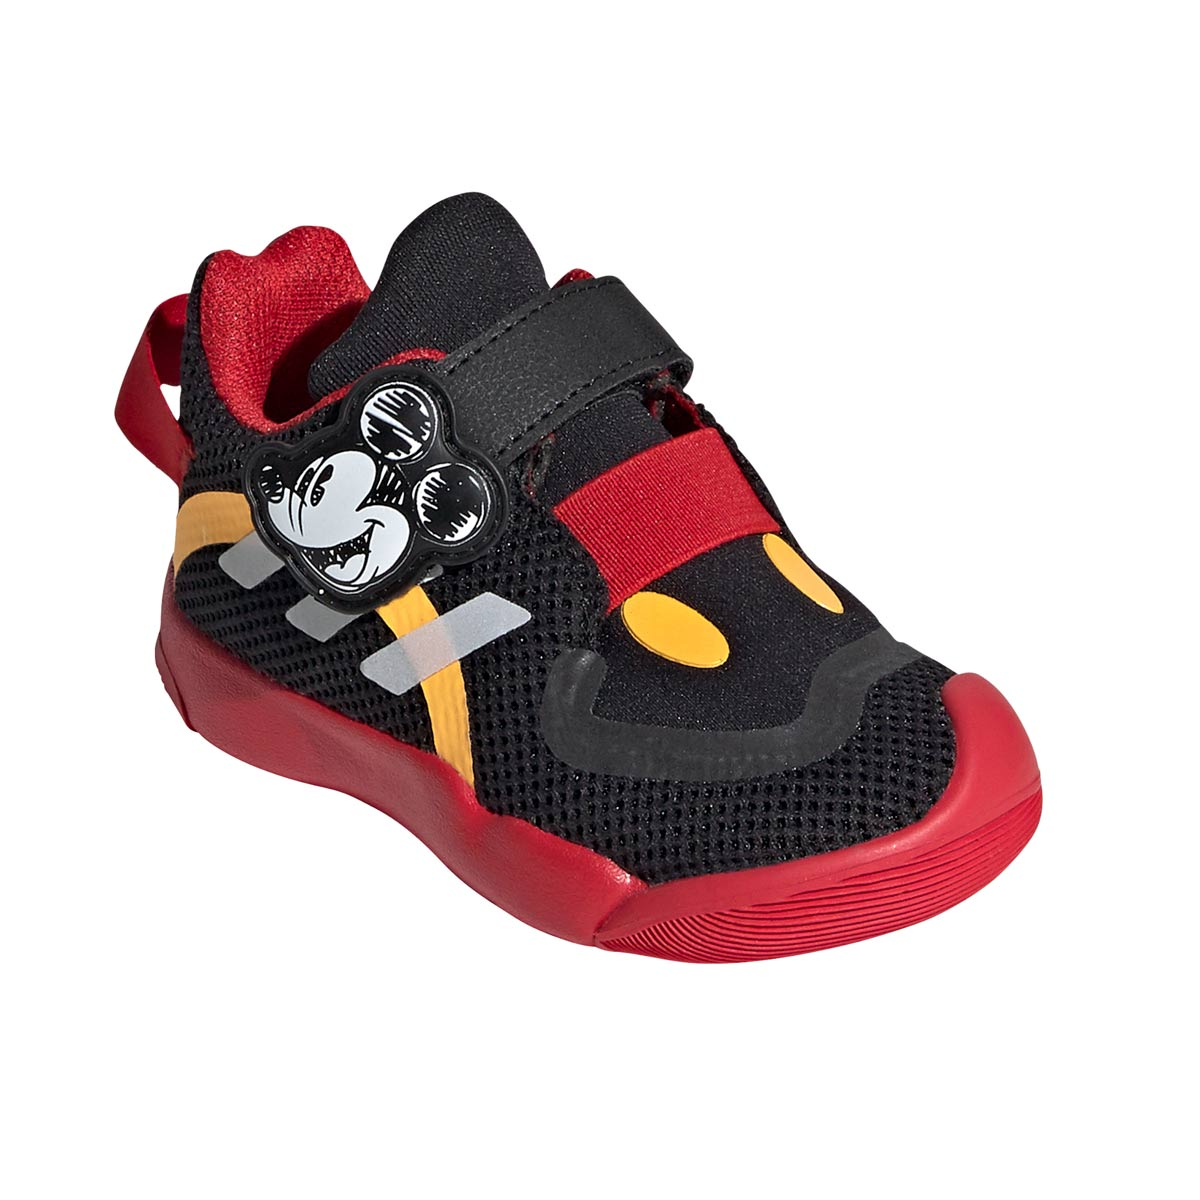 Tenis-Infantil-Adidas-ActivePlay-Disney-Mickey--18-ao-25-FV4258--3Q20-